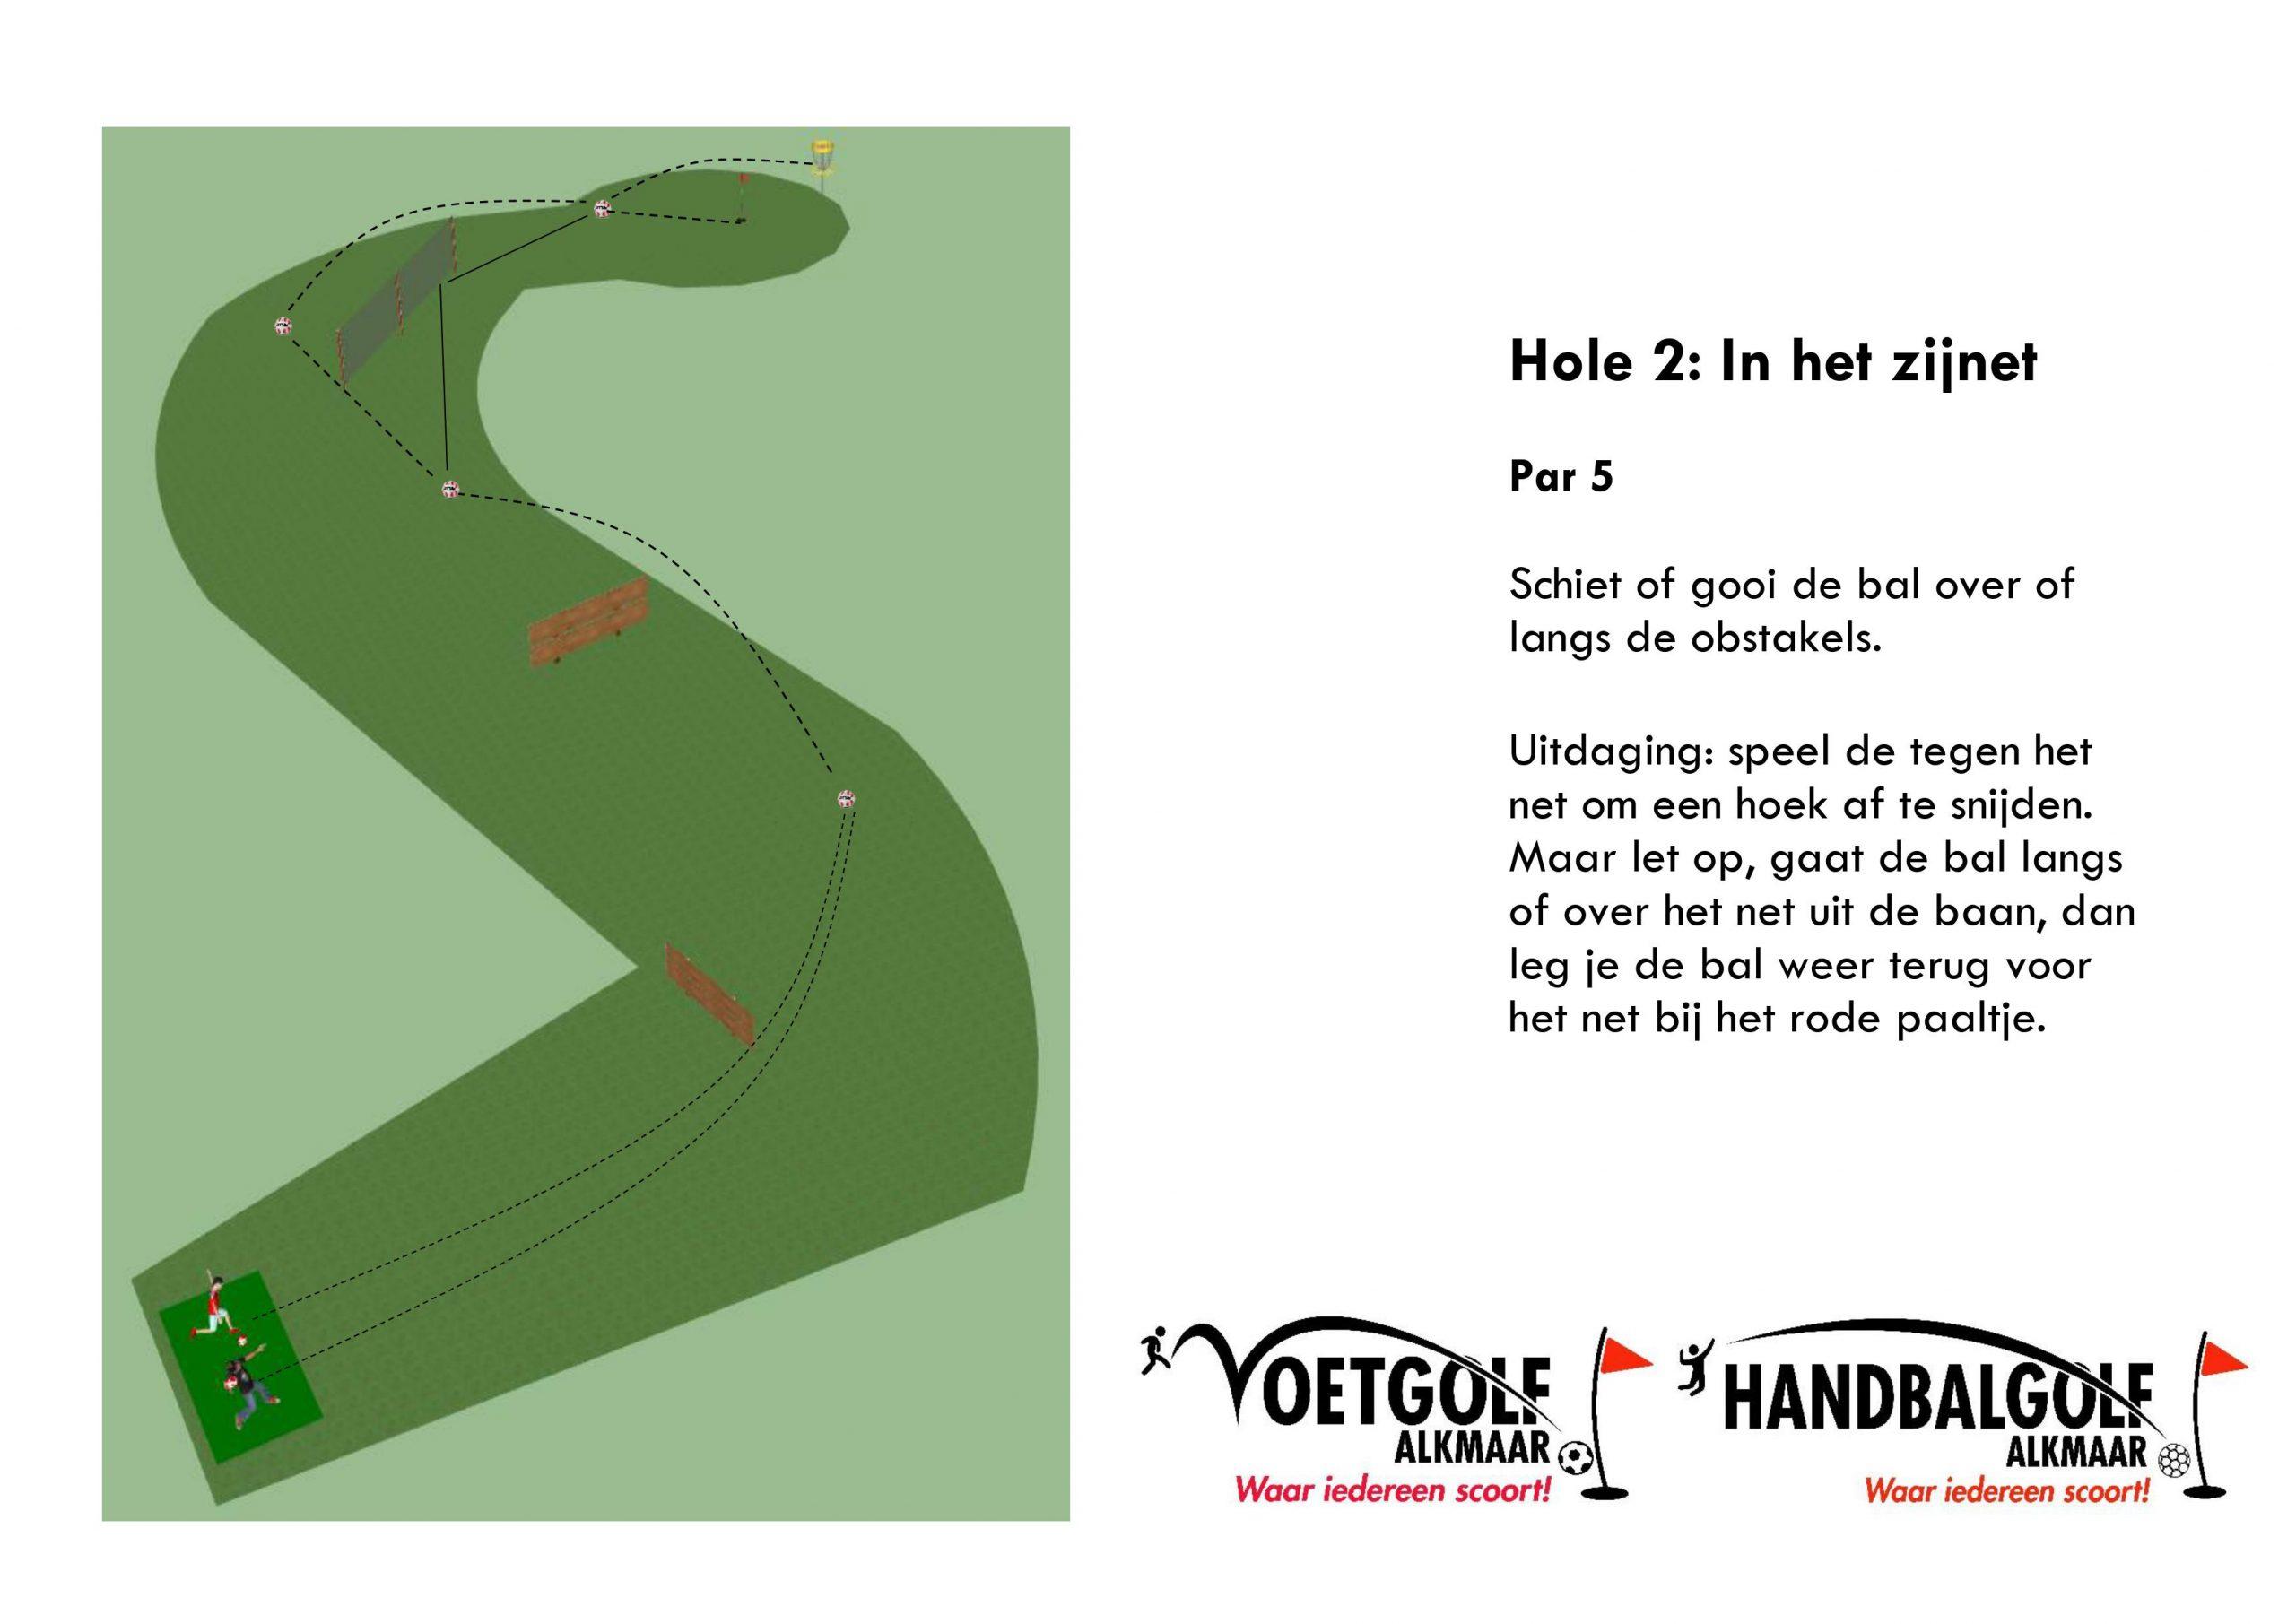 Hole 2 met handbal